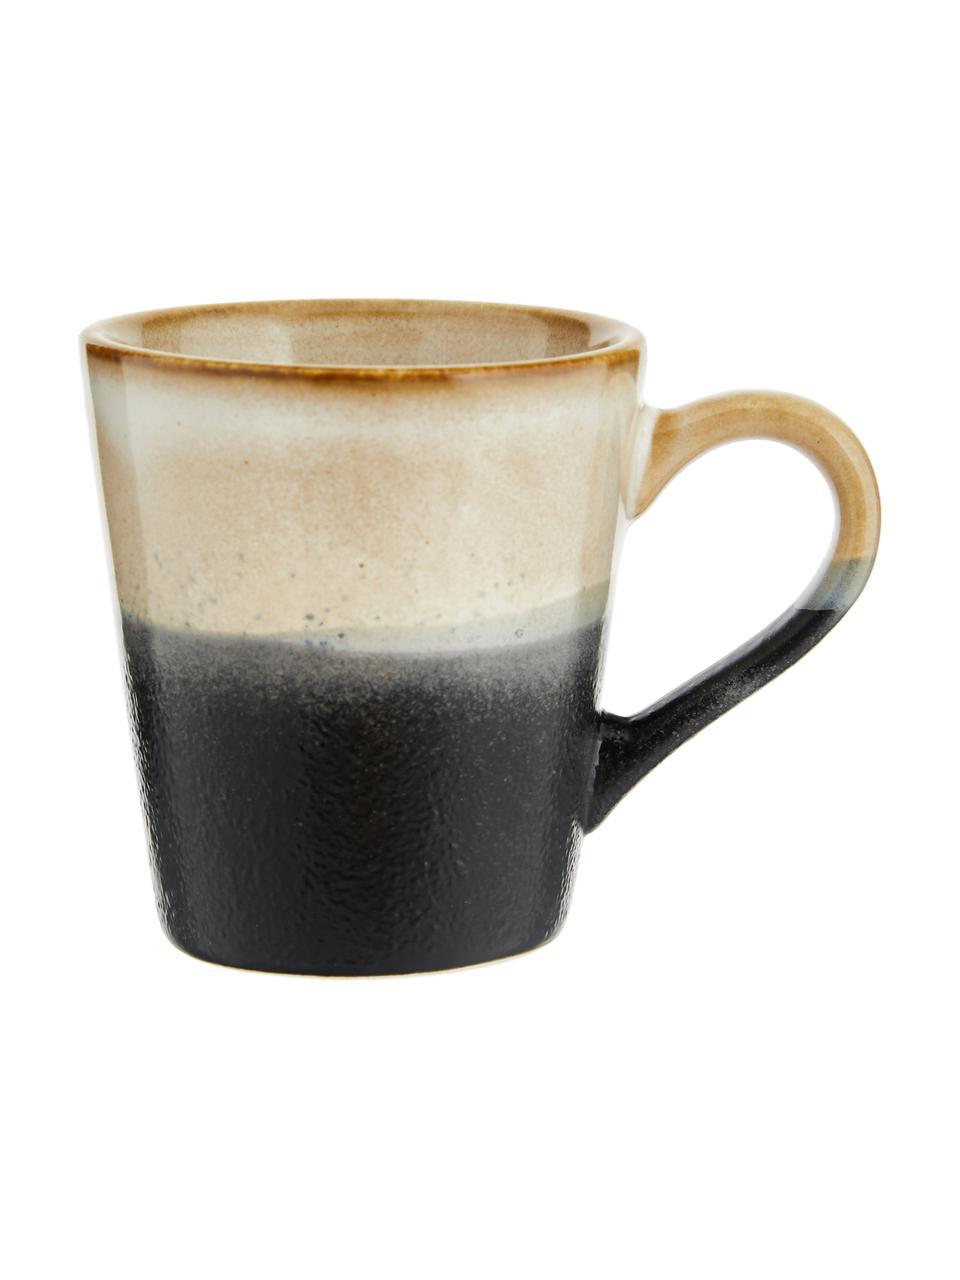 Handgemaakte espresso kopjesset 70's in retro stijl, 4-delig, Keramiek, Multicolour, Ø 6 x H 6 cm